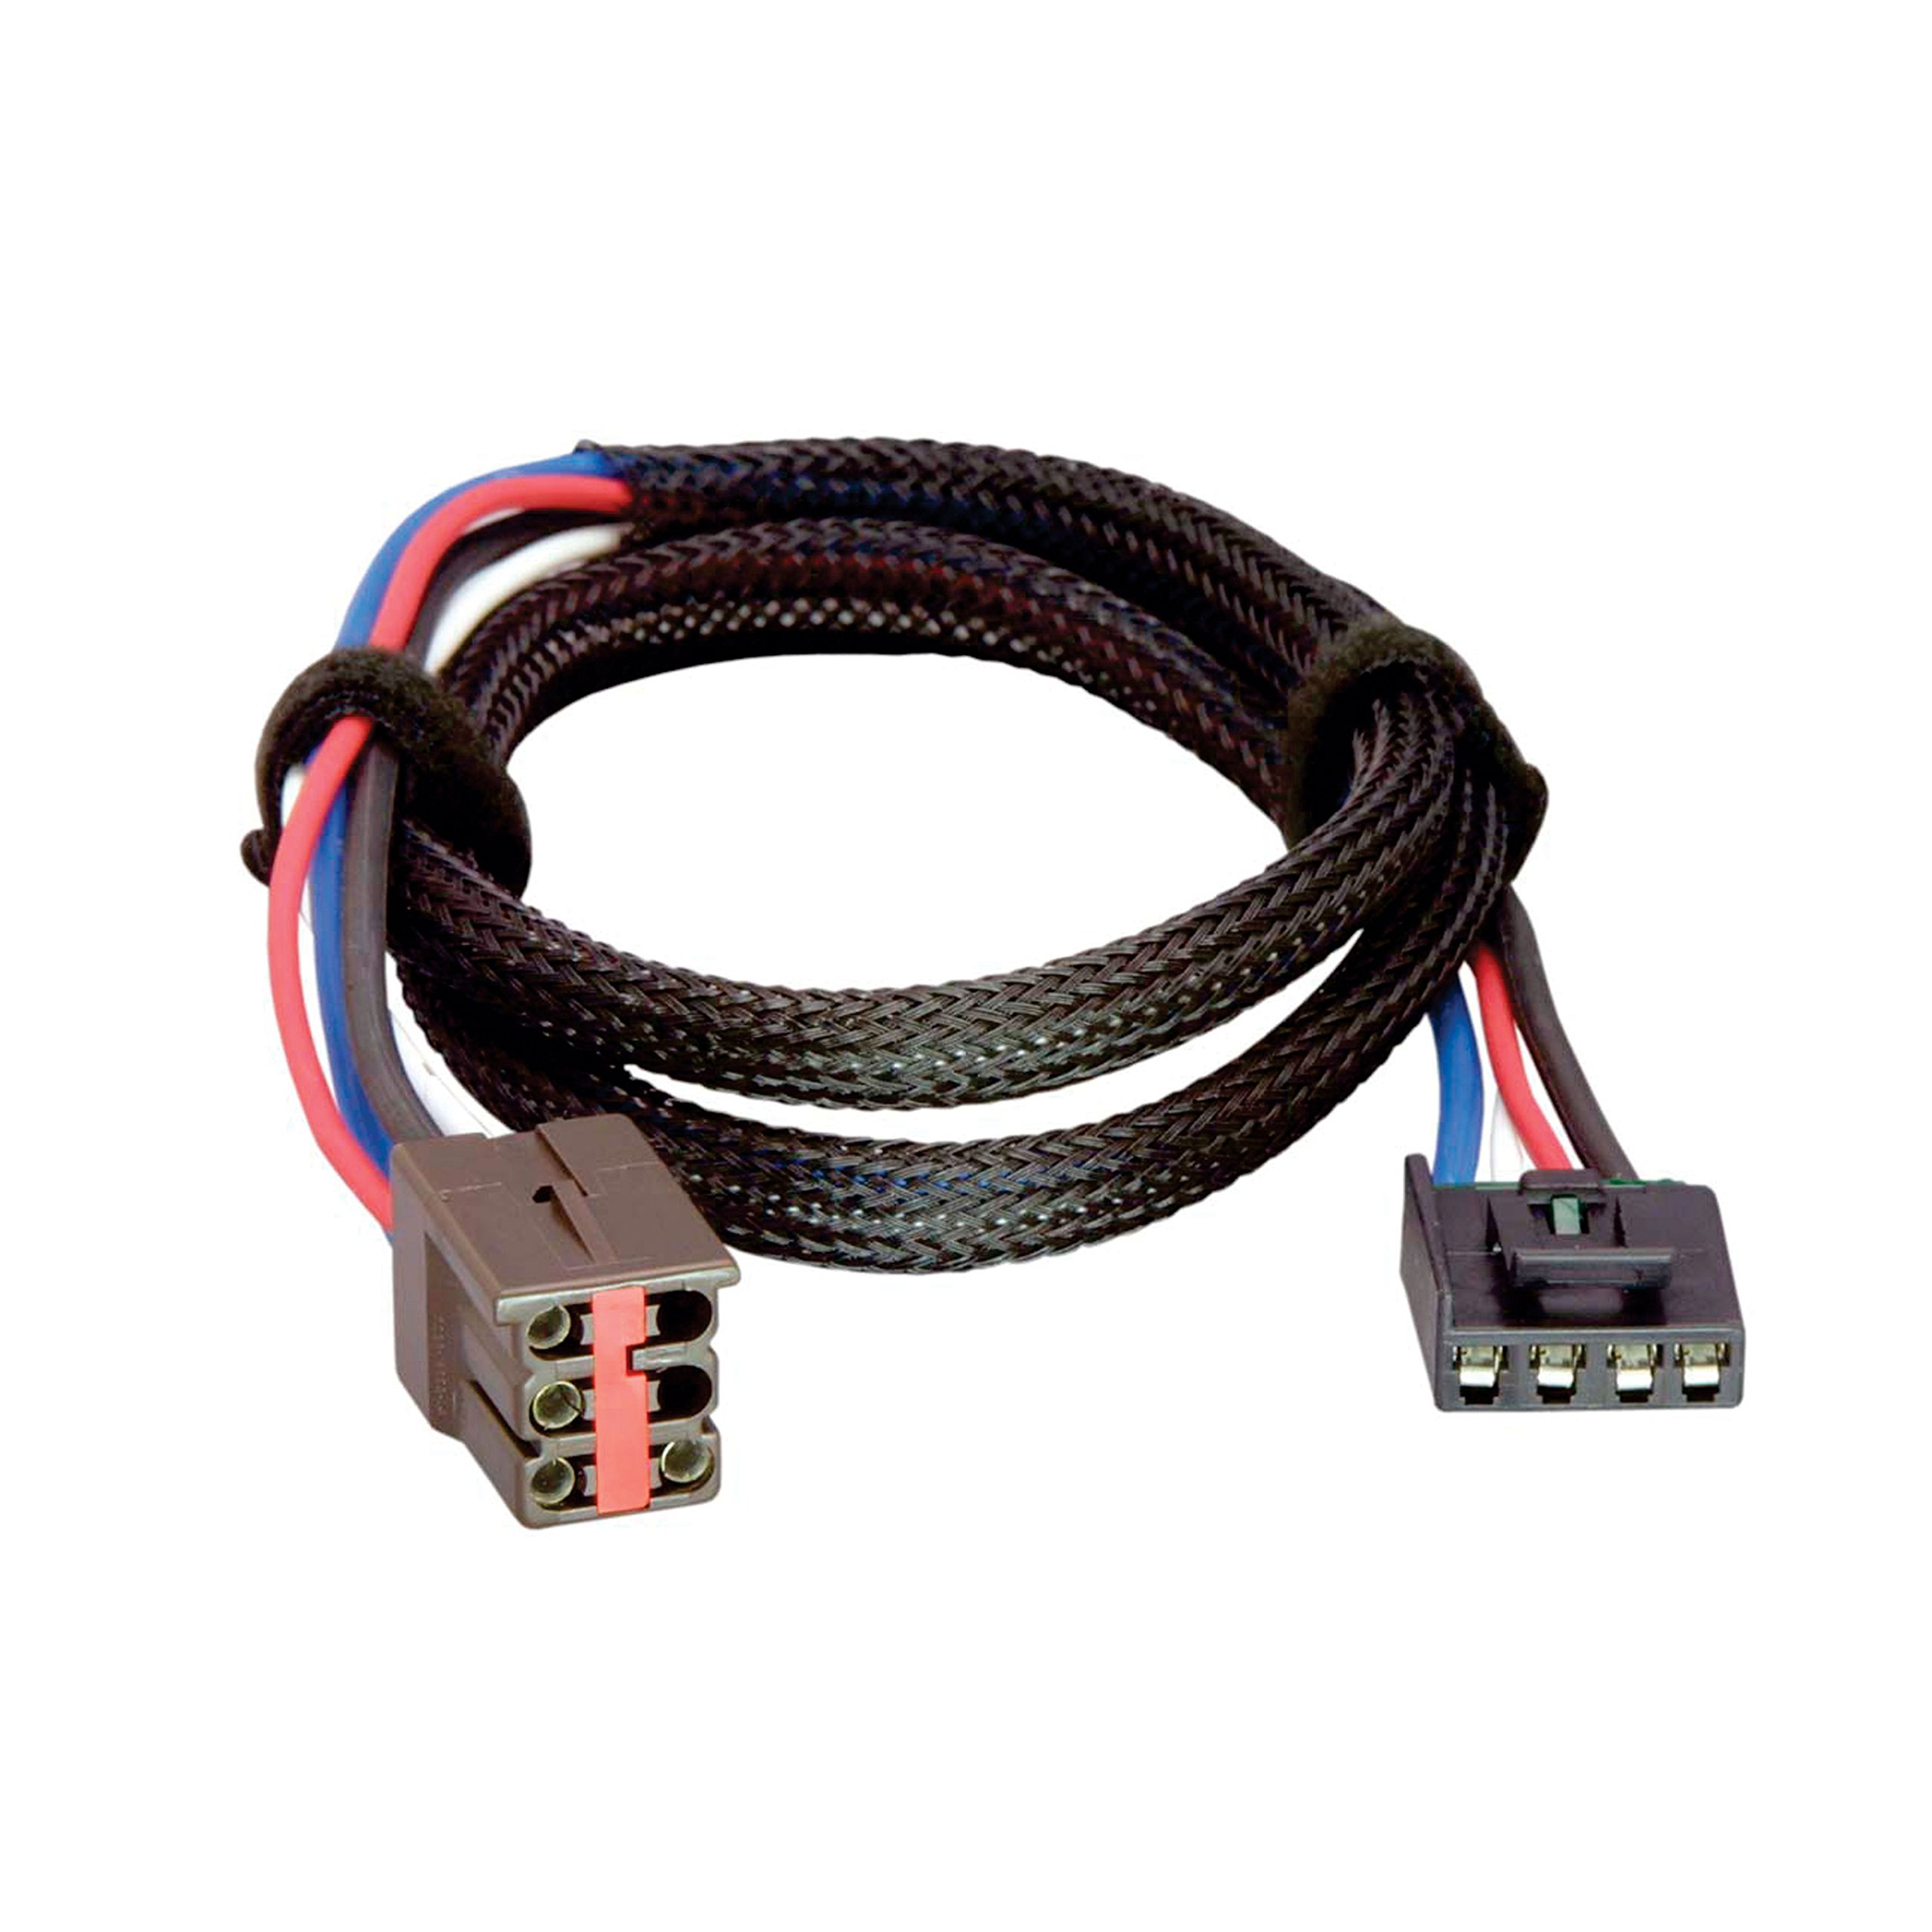 Tekonsha 3035-P Brake Control Wiring Adapter for Ford by Tekonsha